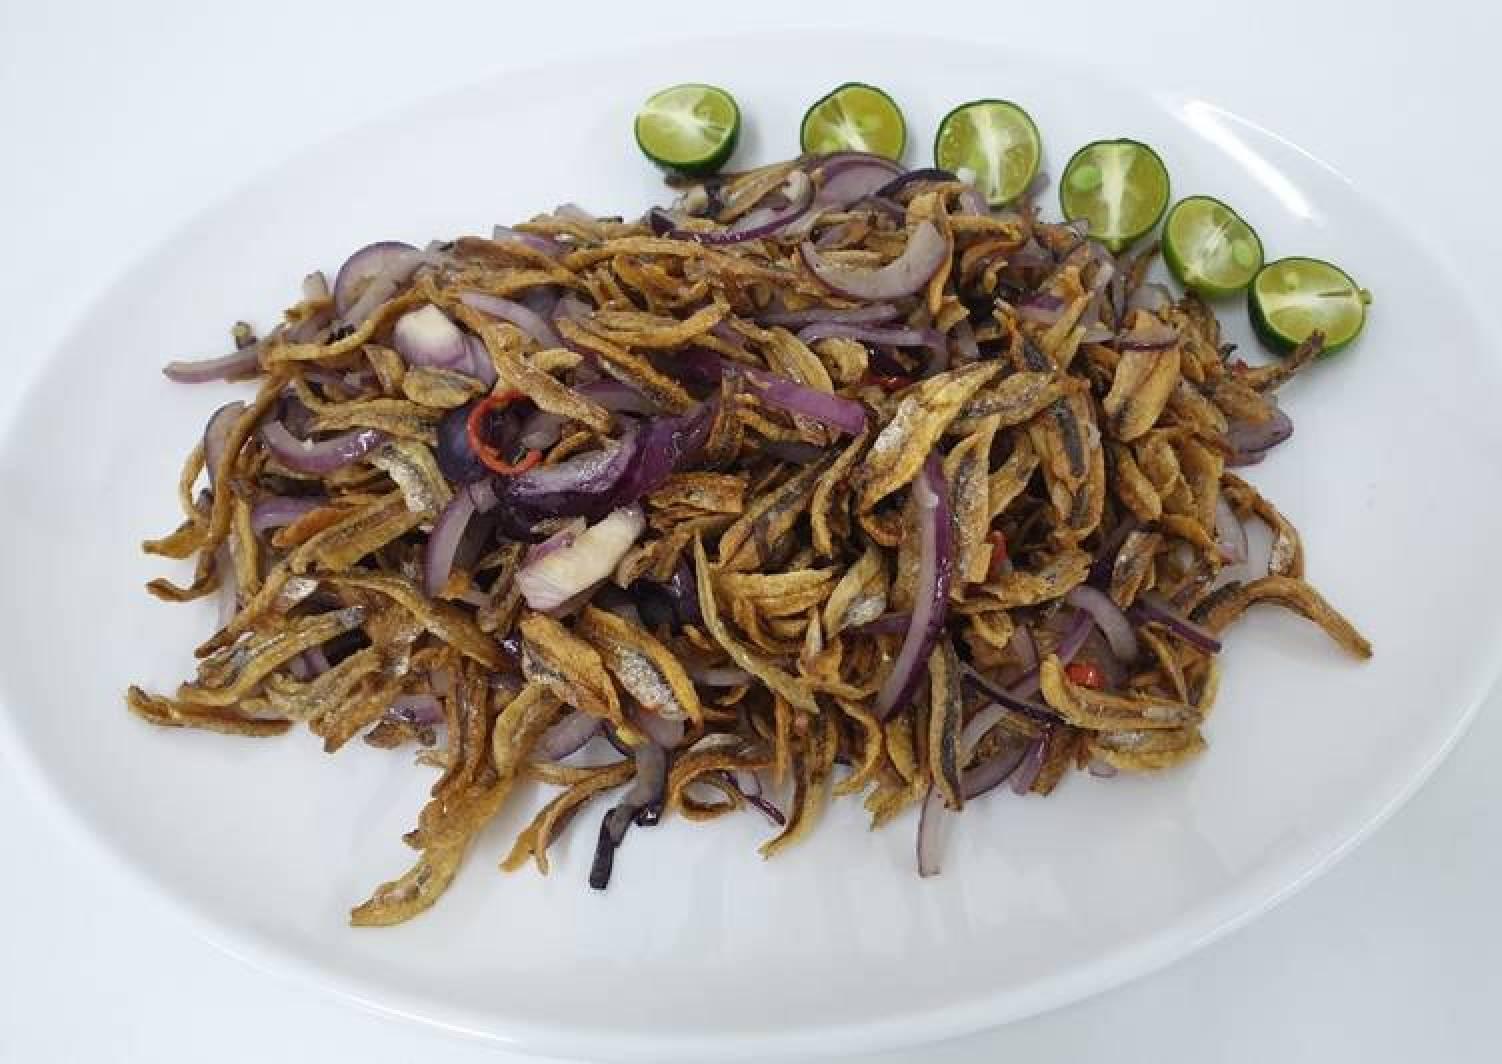 Chilis Anchovies 香辣江鱼仔